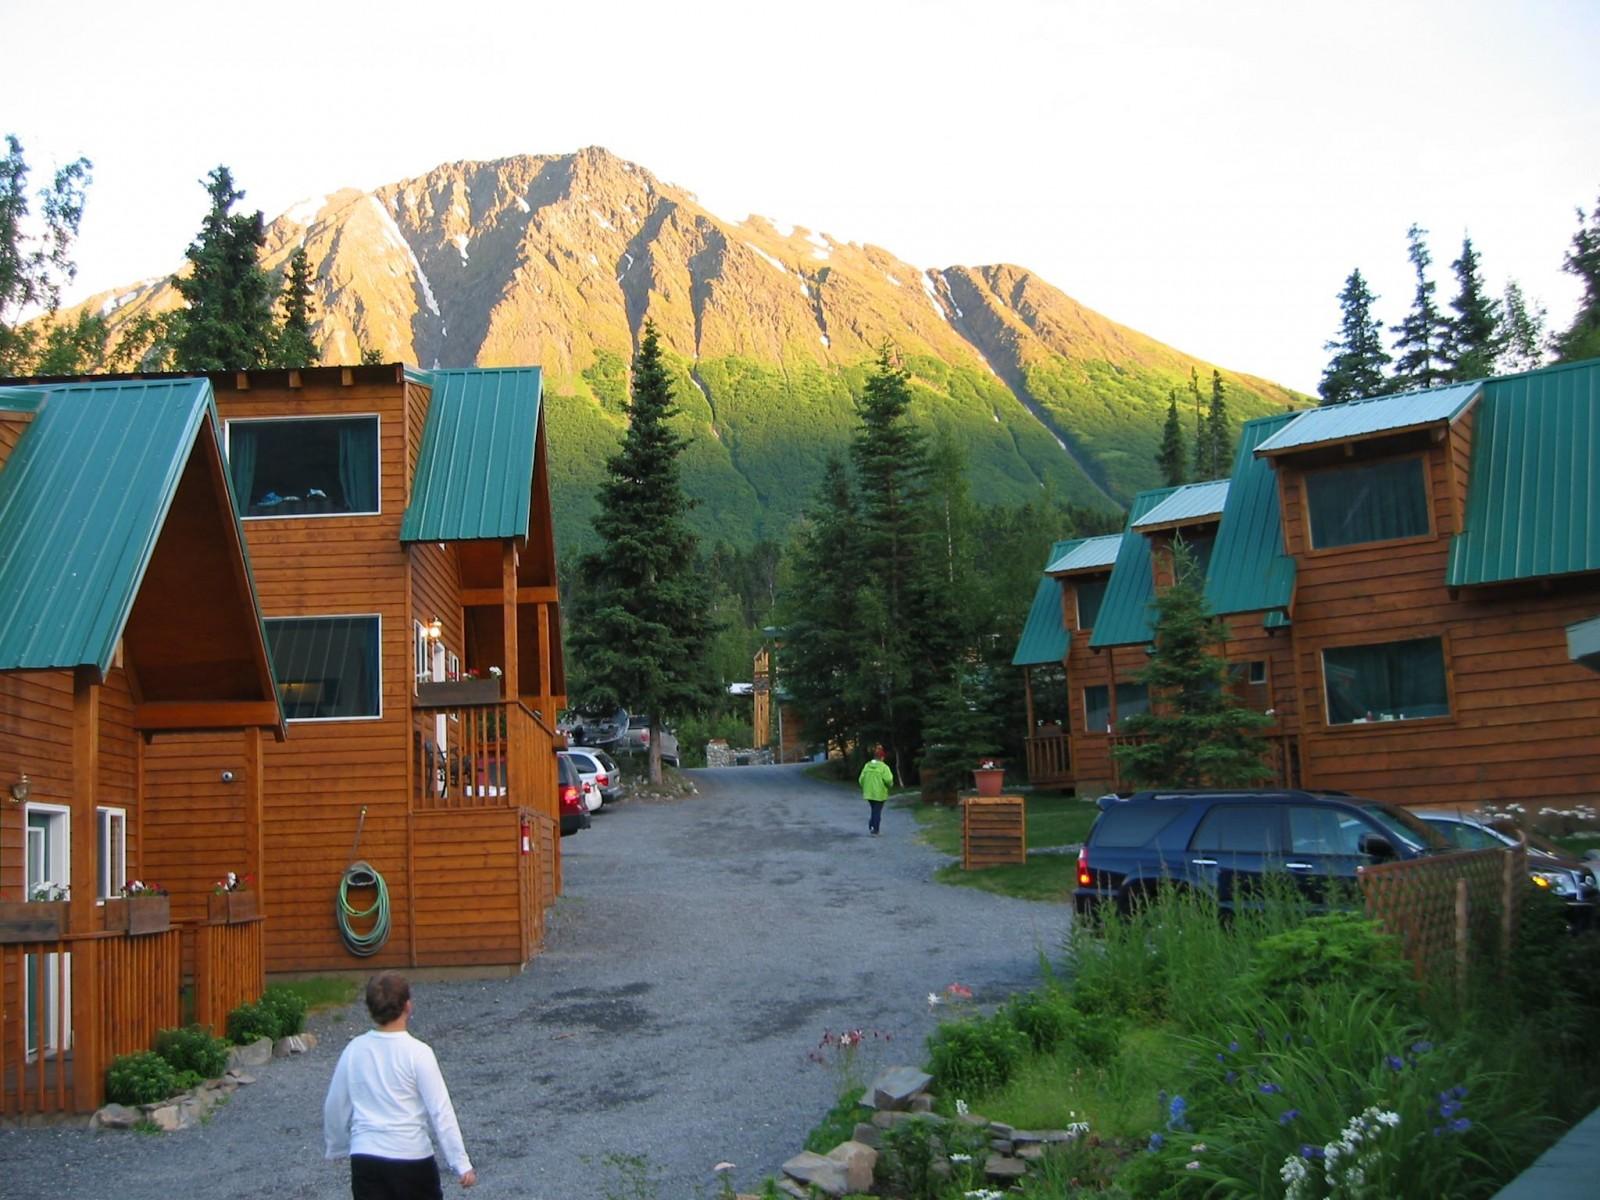 Kenai river drifters lodge south central alaska my for Alaska fishing lodge